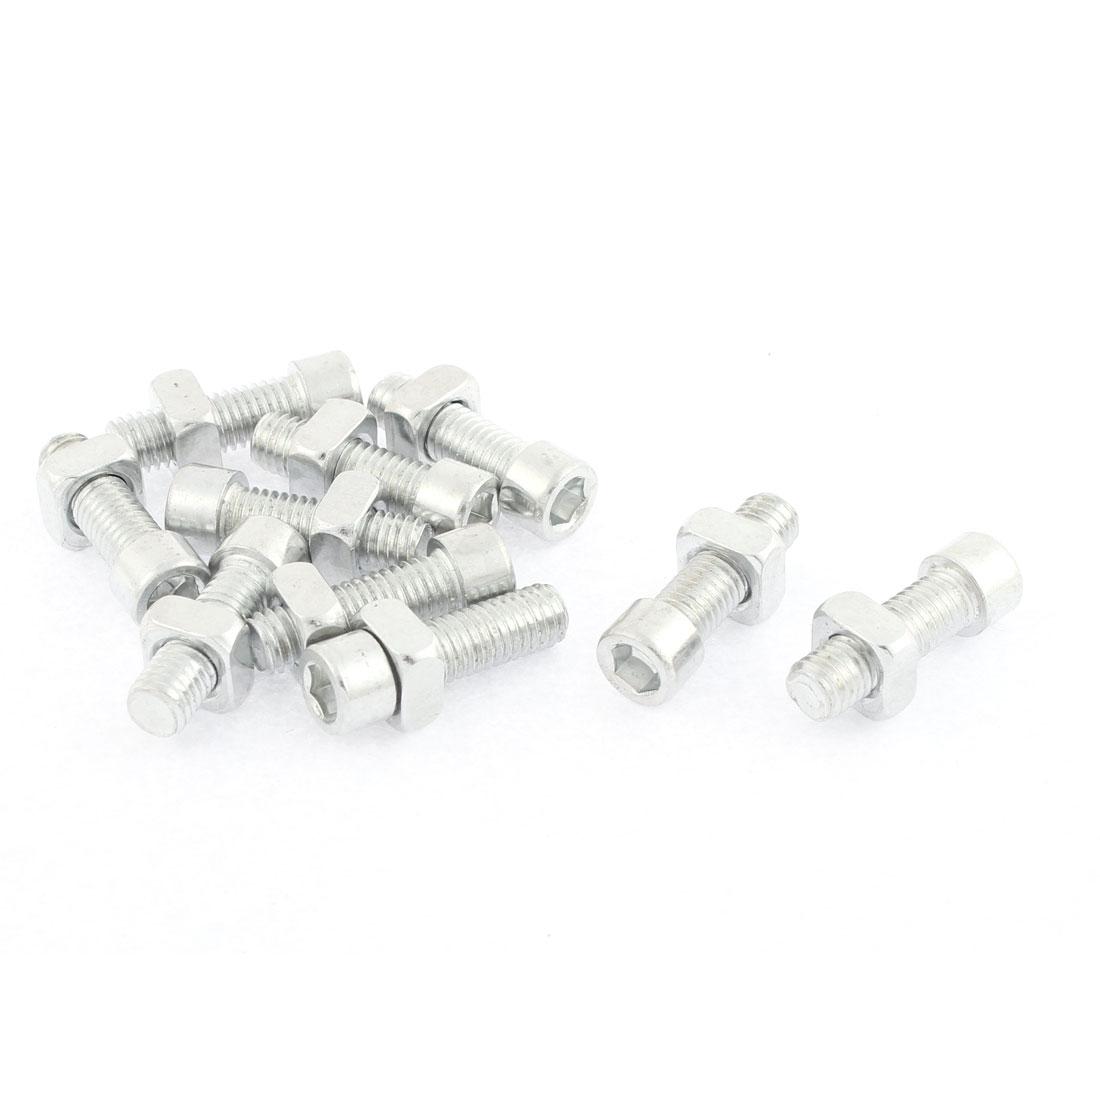 10Pcs M8 x 25mm Thread 32mm Long Metal Square Nut Hex Socket Cap Screws Bolts Set